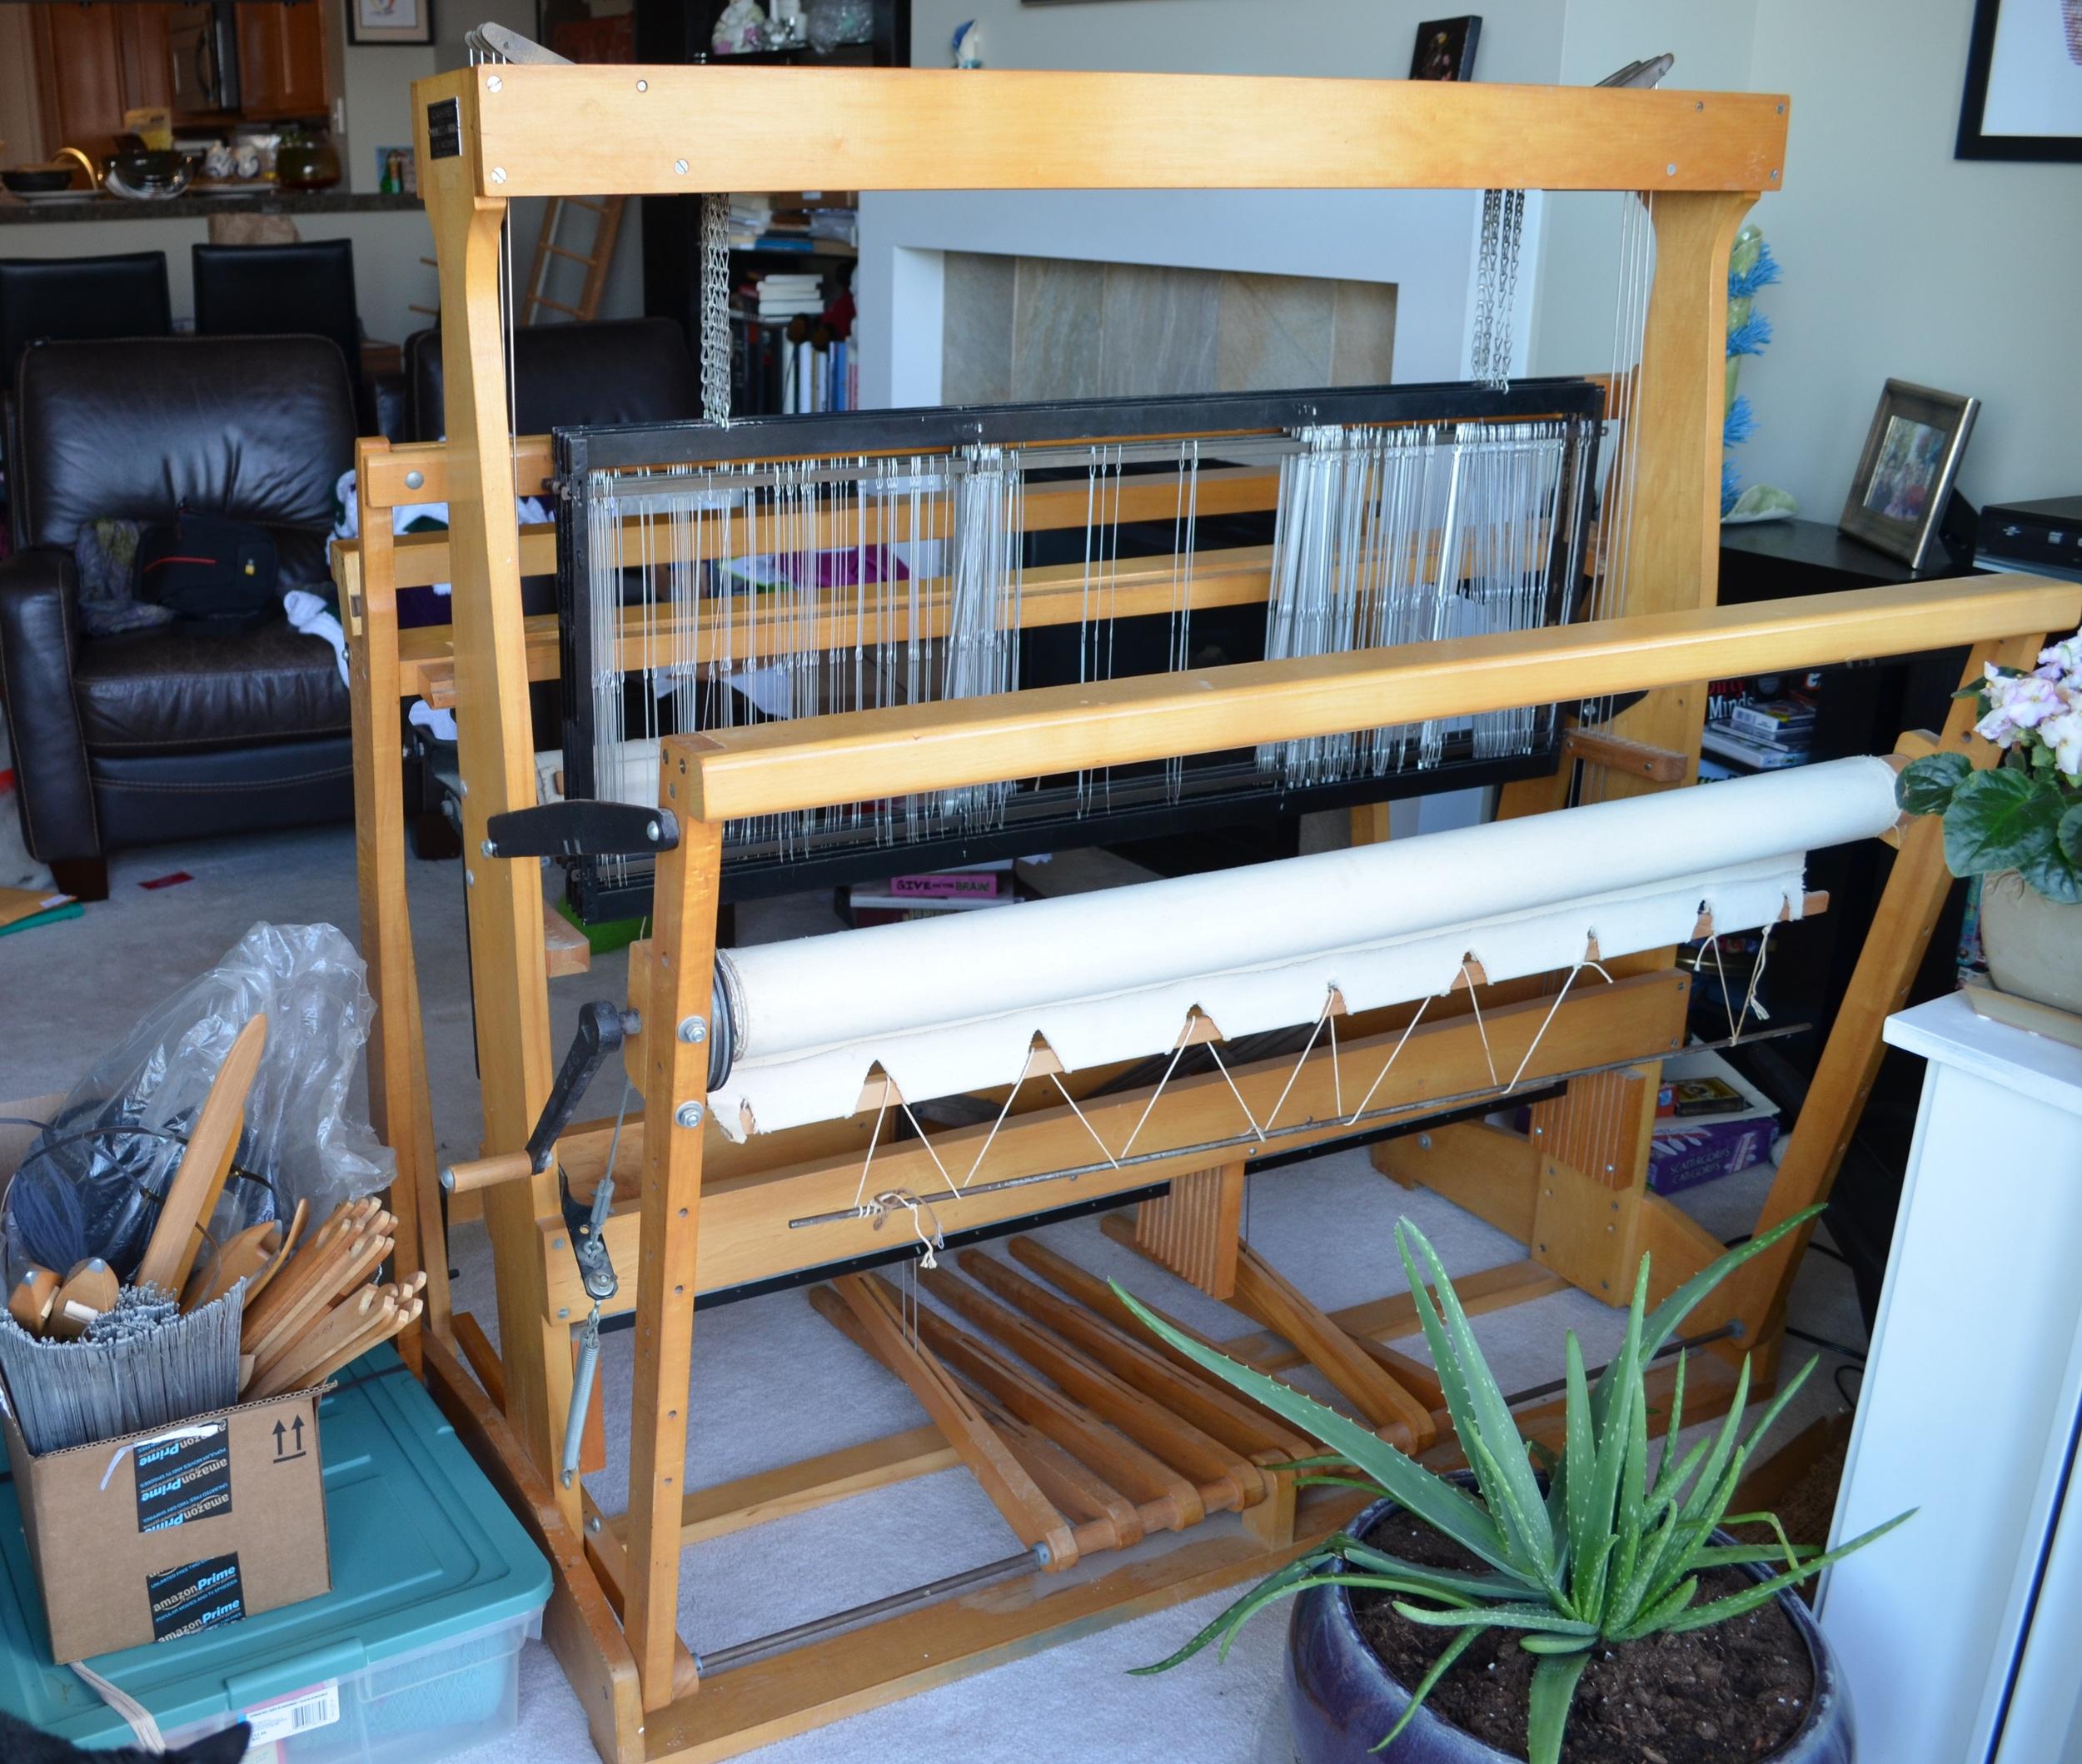 40 inch Macomber Loom